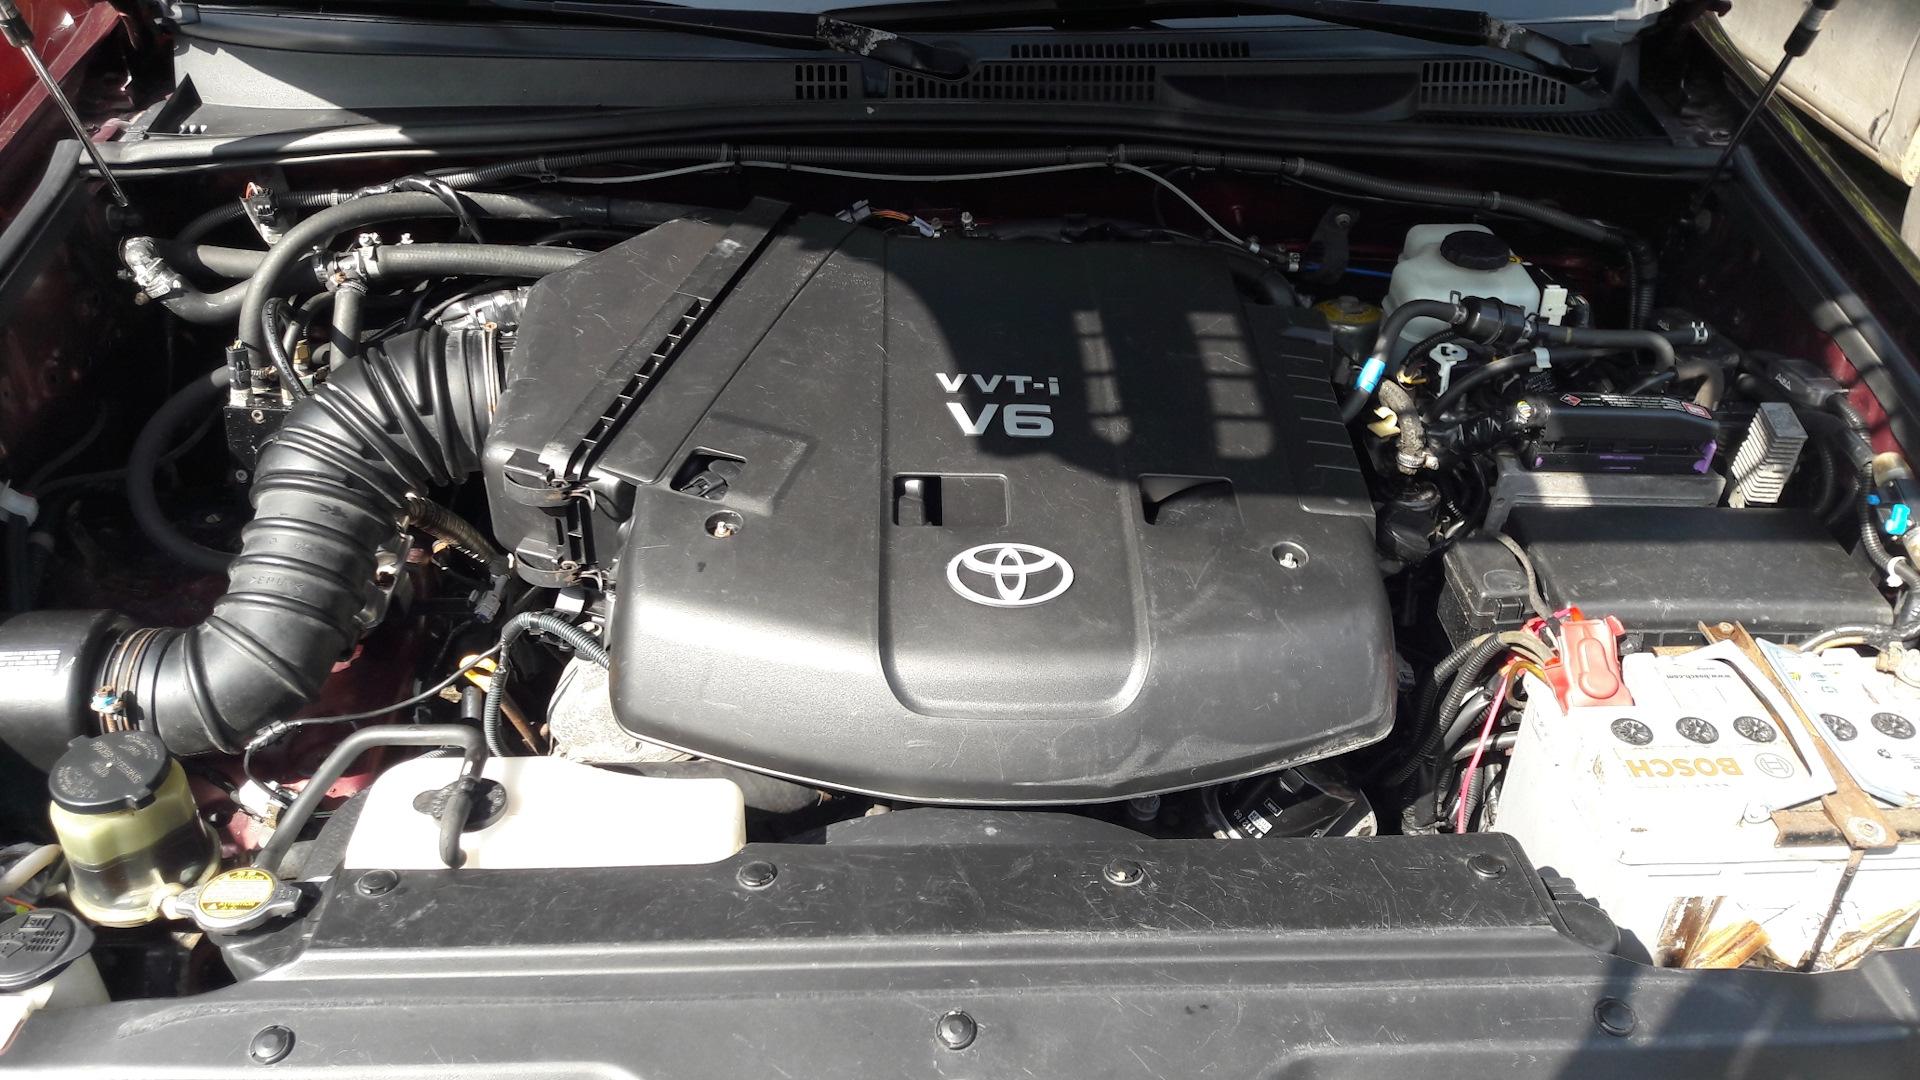 V6 двигатель тлк 100